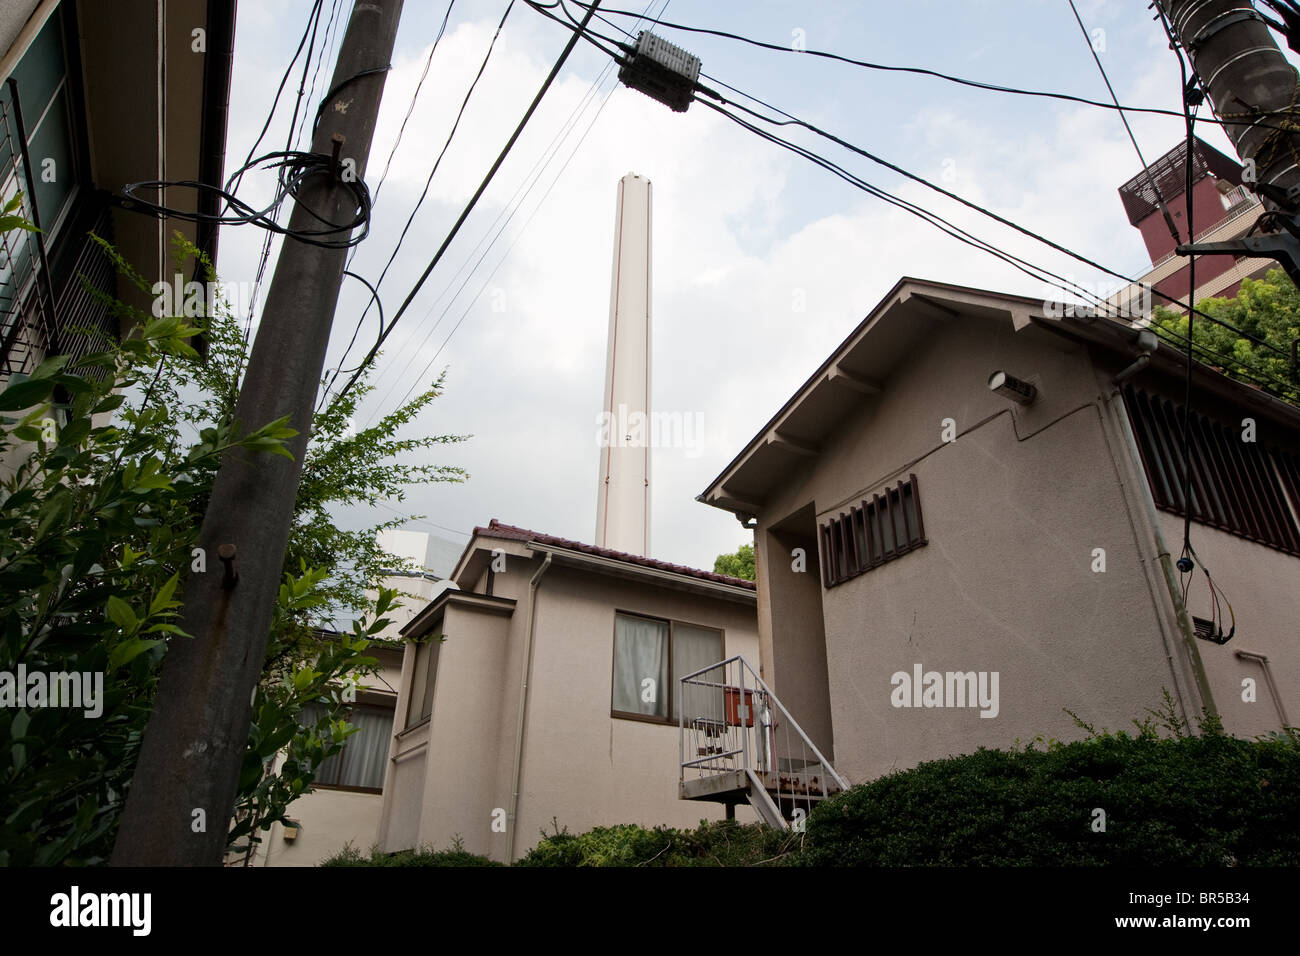 Shibuya Seisoh Kojo (garbage incinerator plant) with it's large chimney, in Shibuya district in Tokyo, Japan - Stock Image